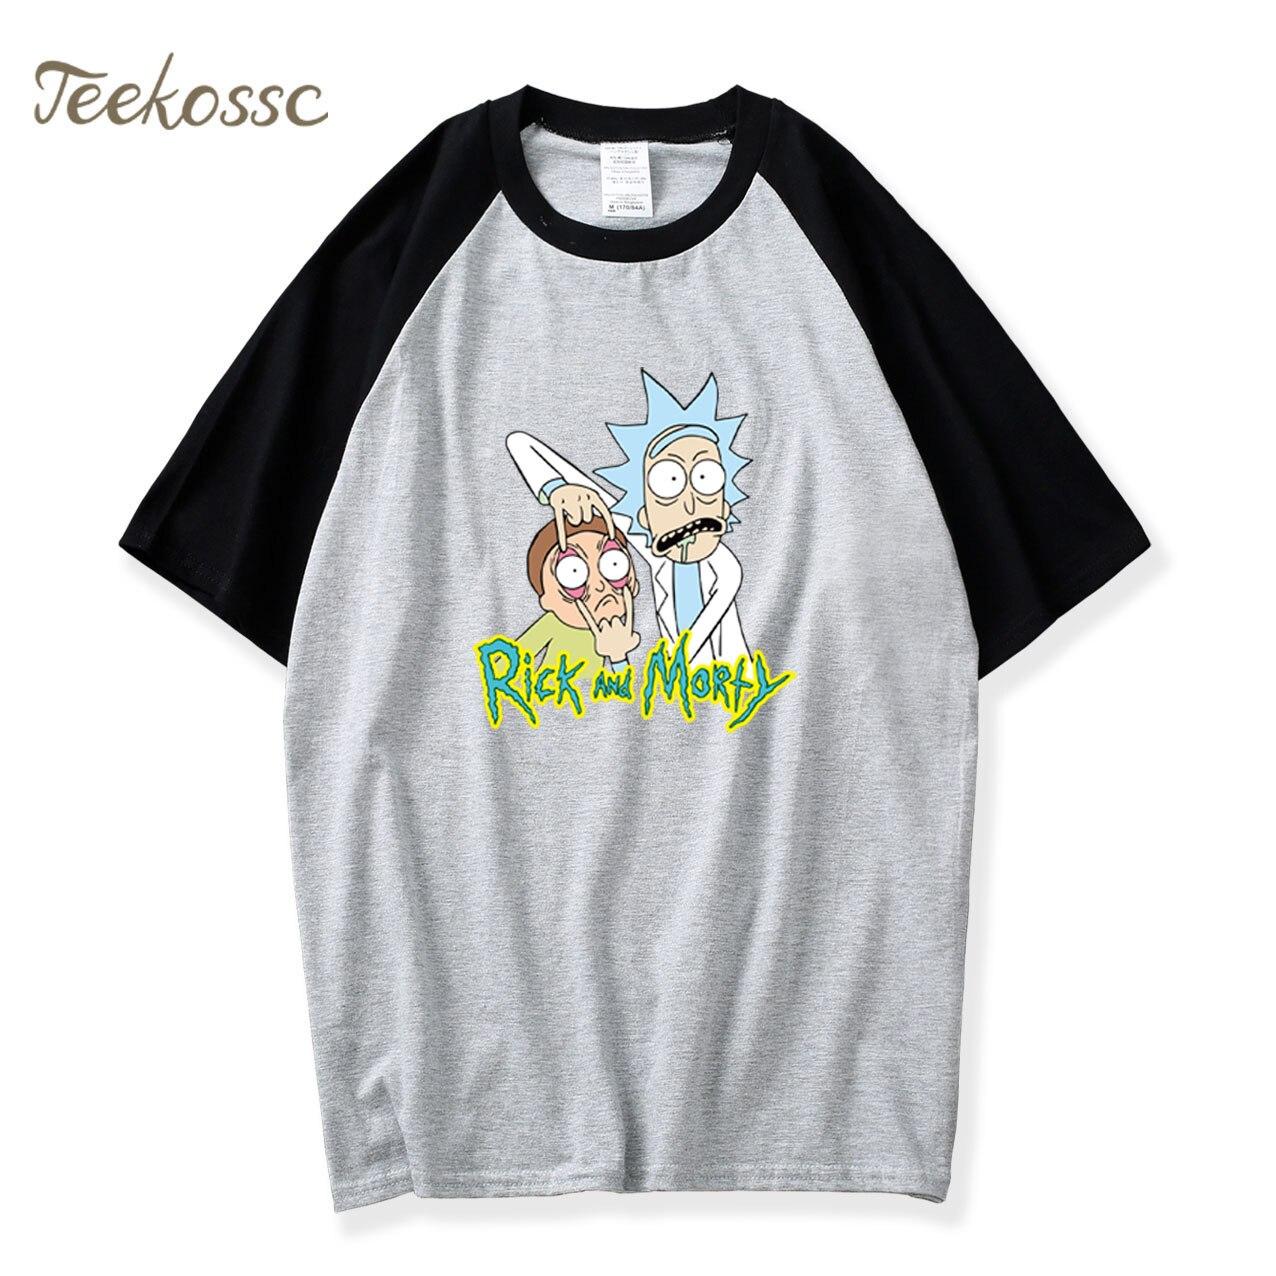 Cartoon Rick and Morty Tshirt 2018 New Summer Raglan T Shirt Homme Men Pop Camiseta Tops Tee 100% Cotton Anime Morty Tshirts